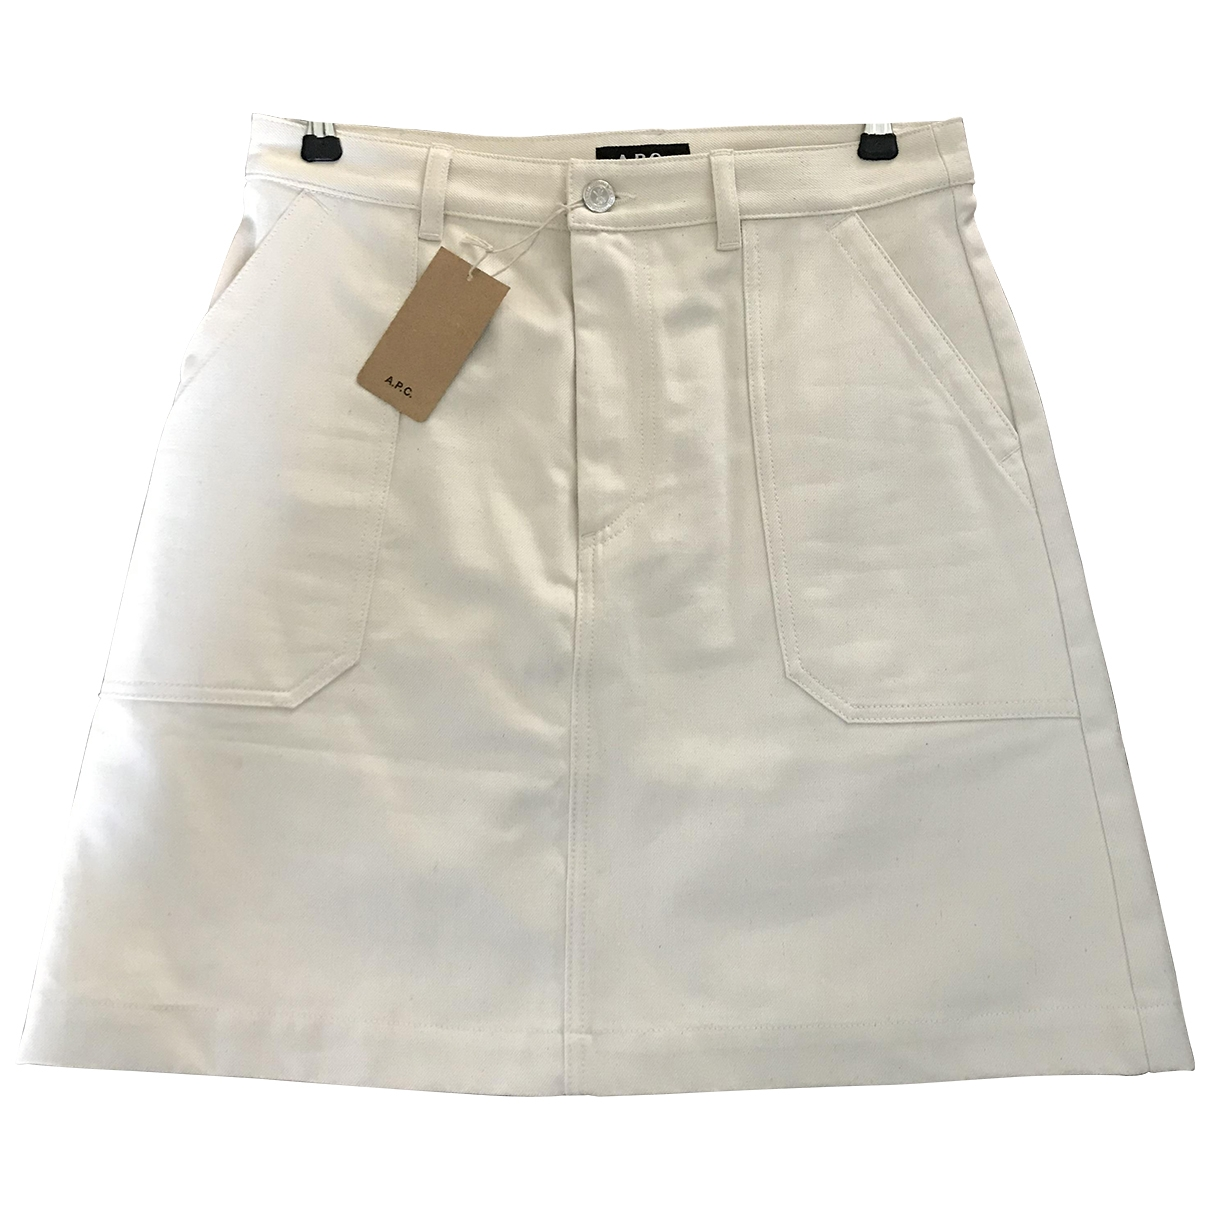 Apc \N Ecru Cotton skirt for Women 38 FR